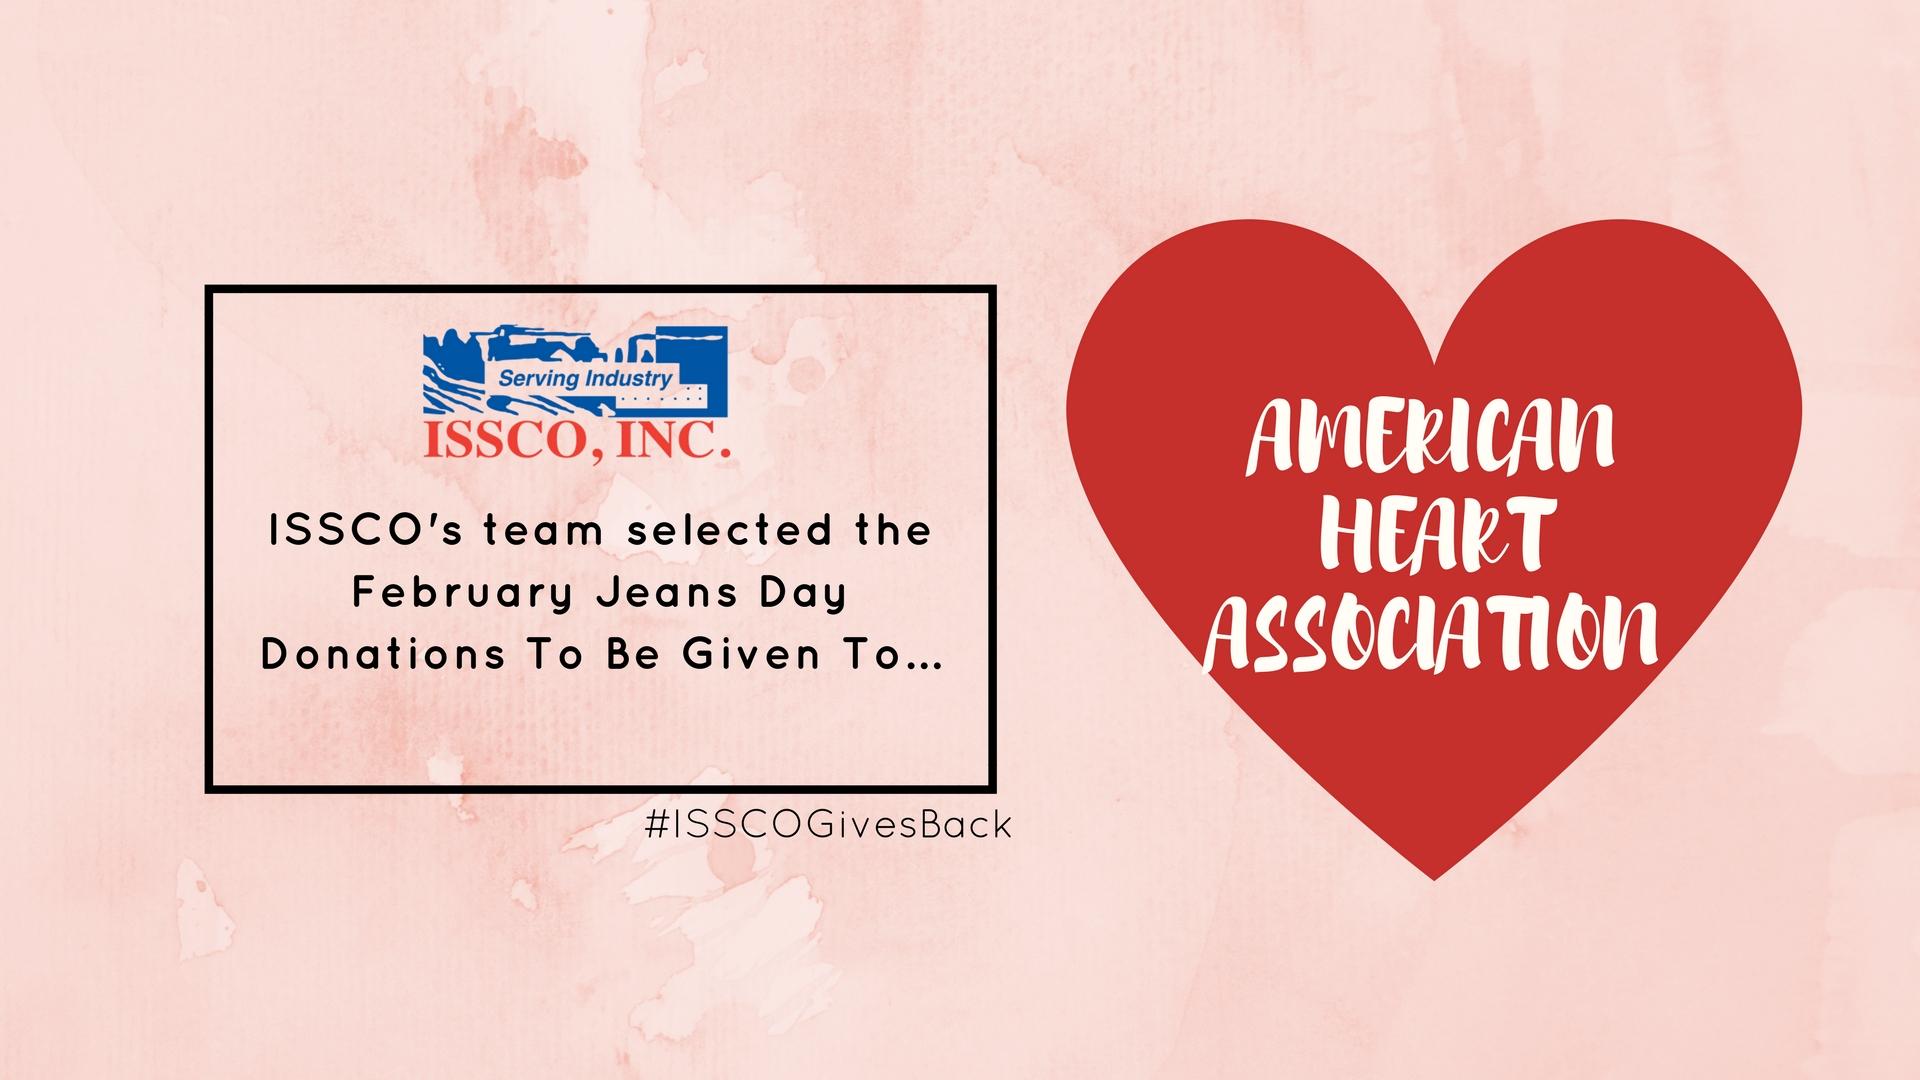 ISSCO Team Donates to American Heart Association